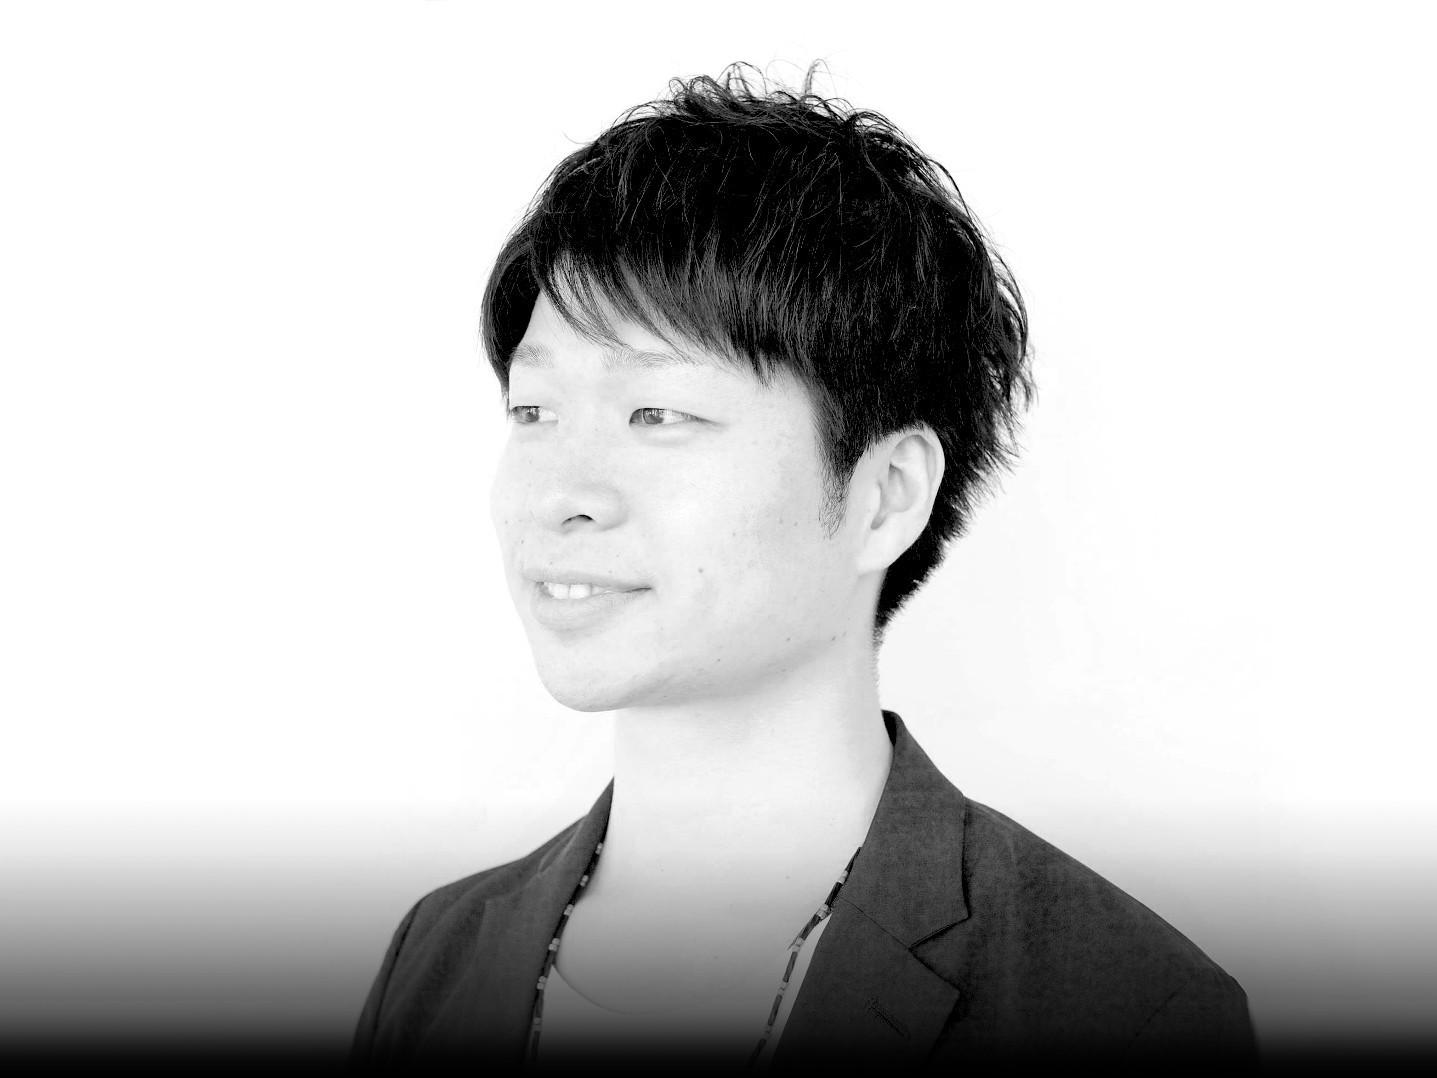 Image of Atsushi Otaki